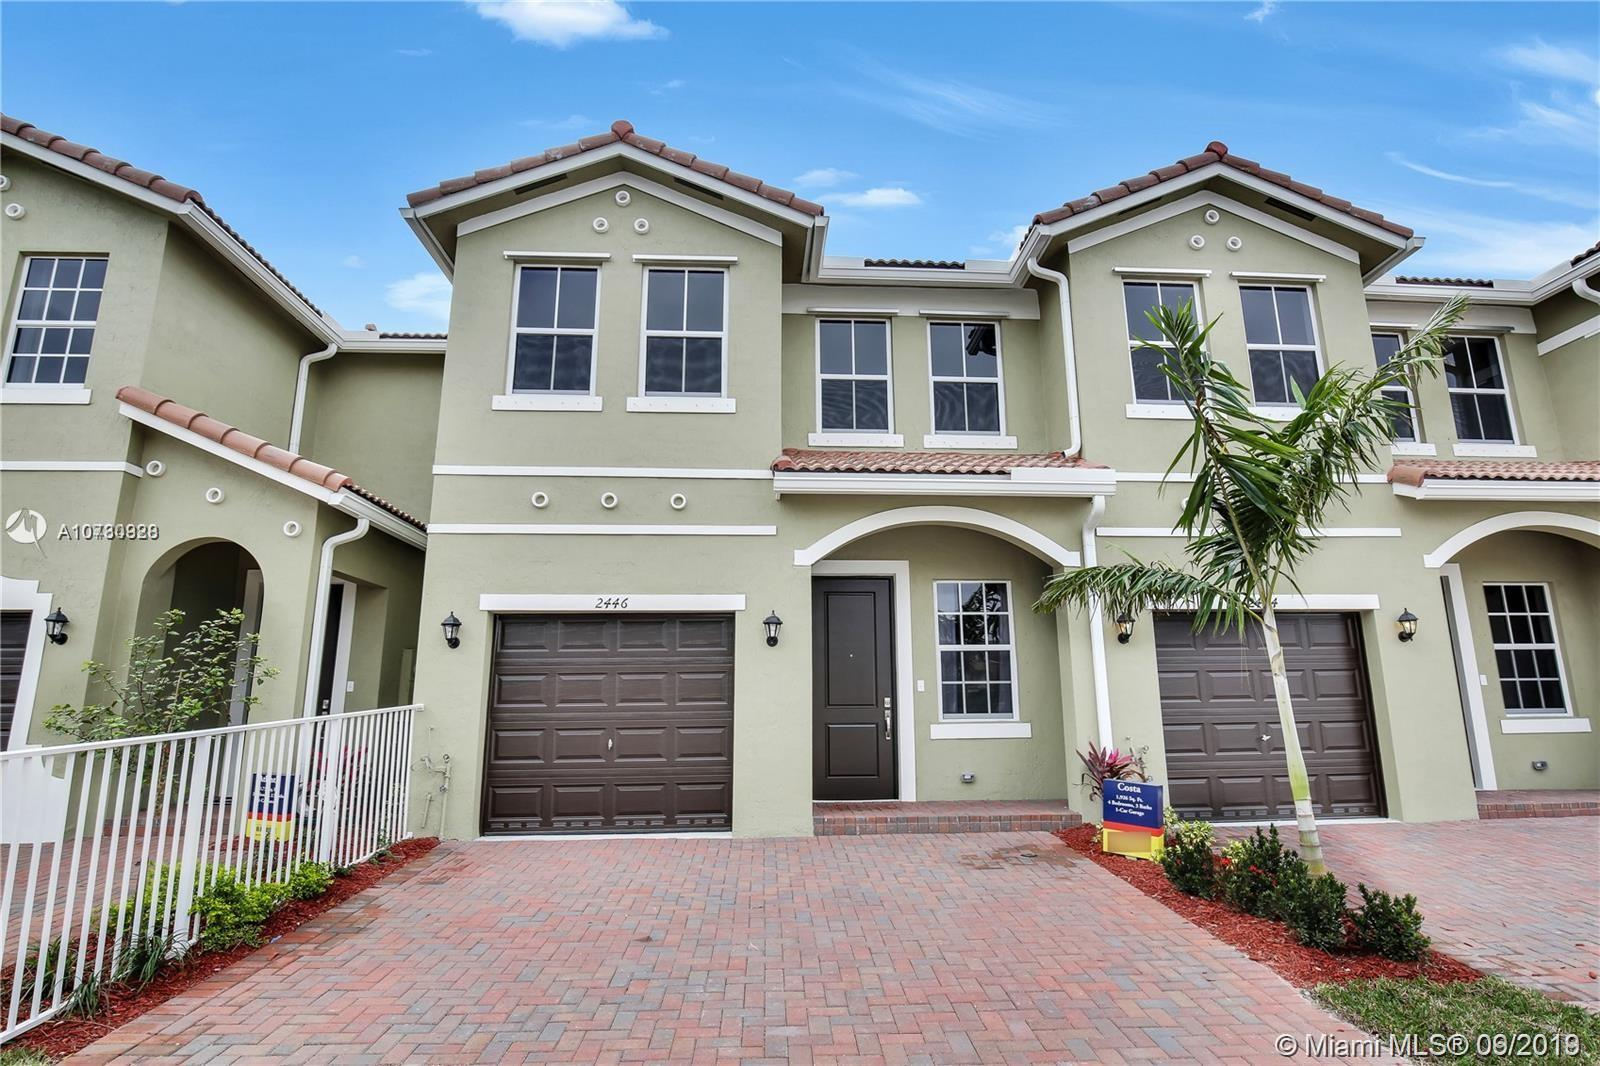 1443 SE 26th Ave, Homestead, FL 33035 - Homestead, FL real estate listing